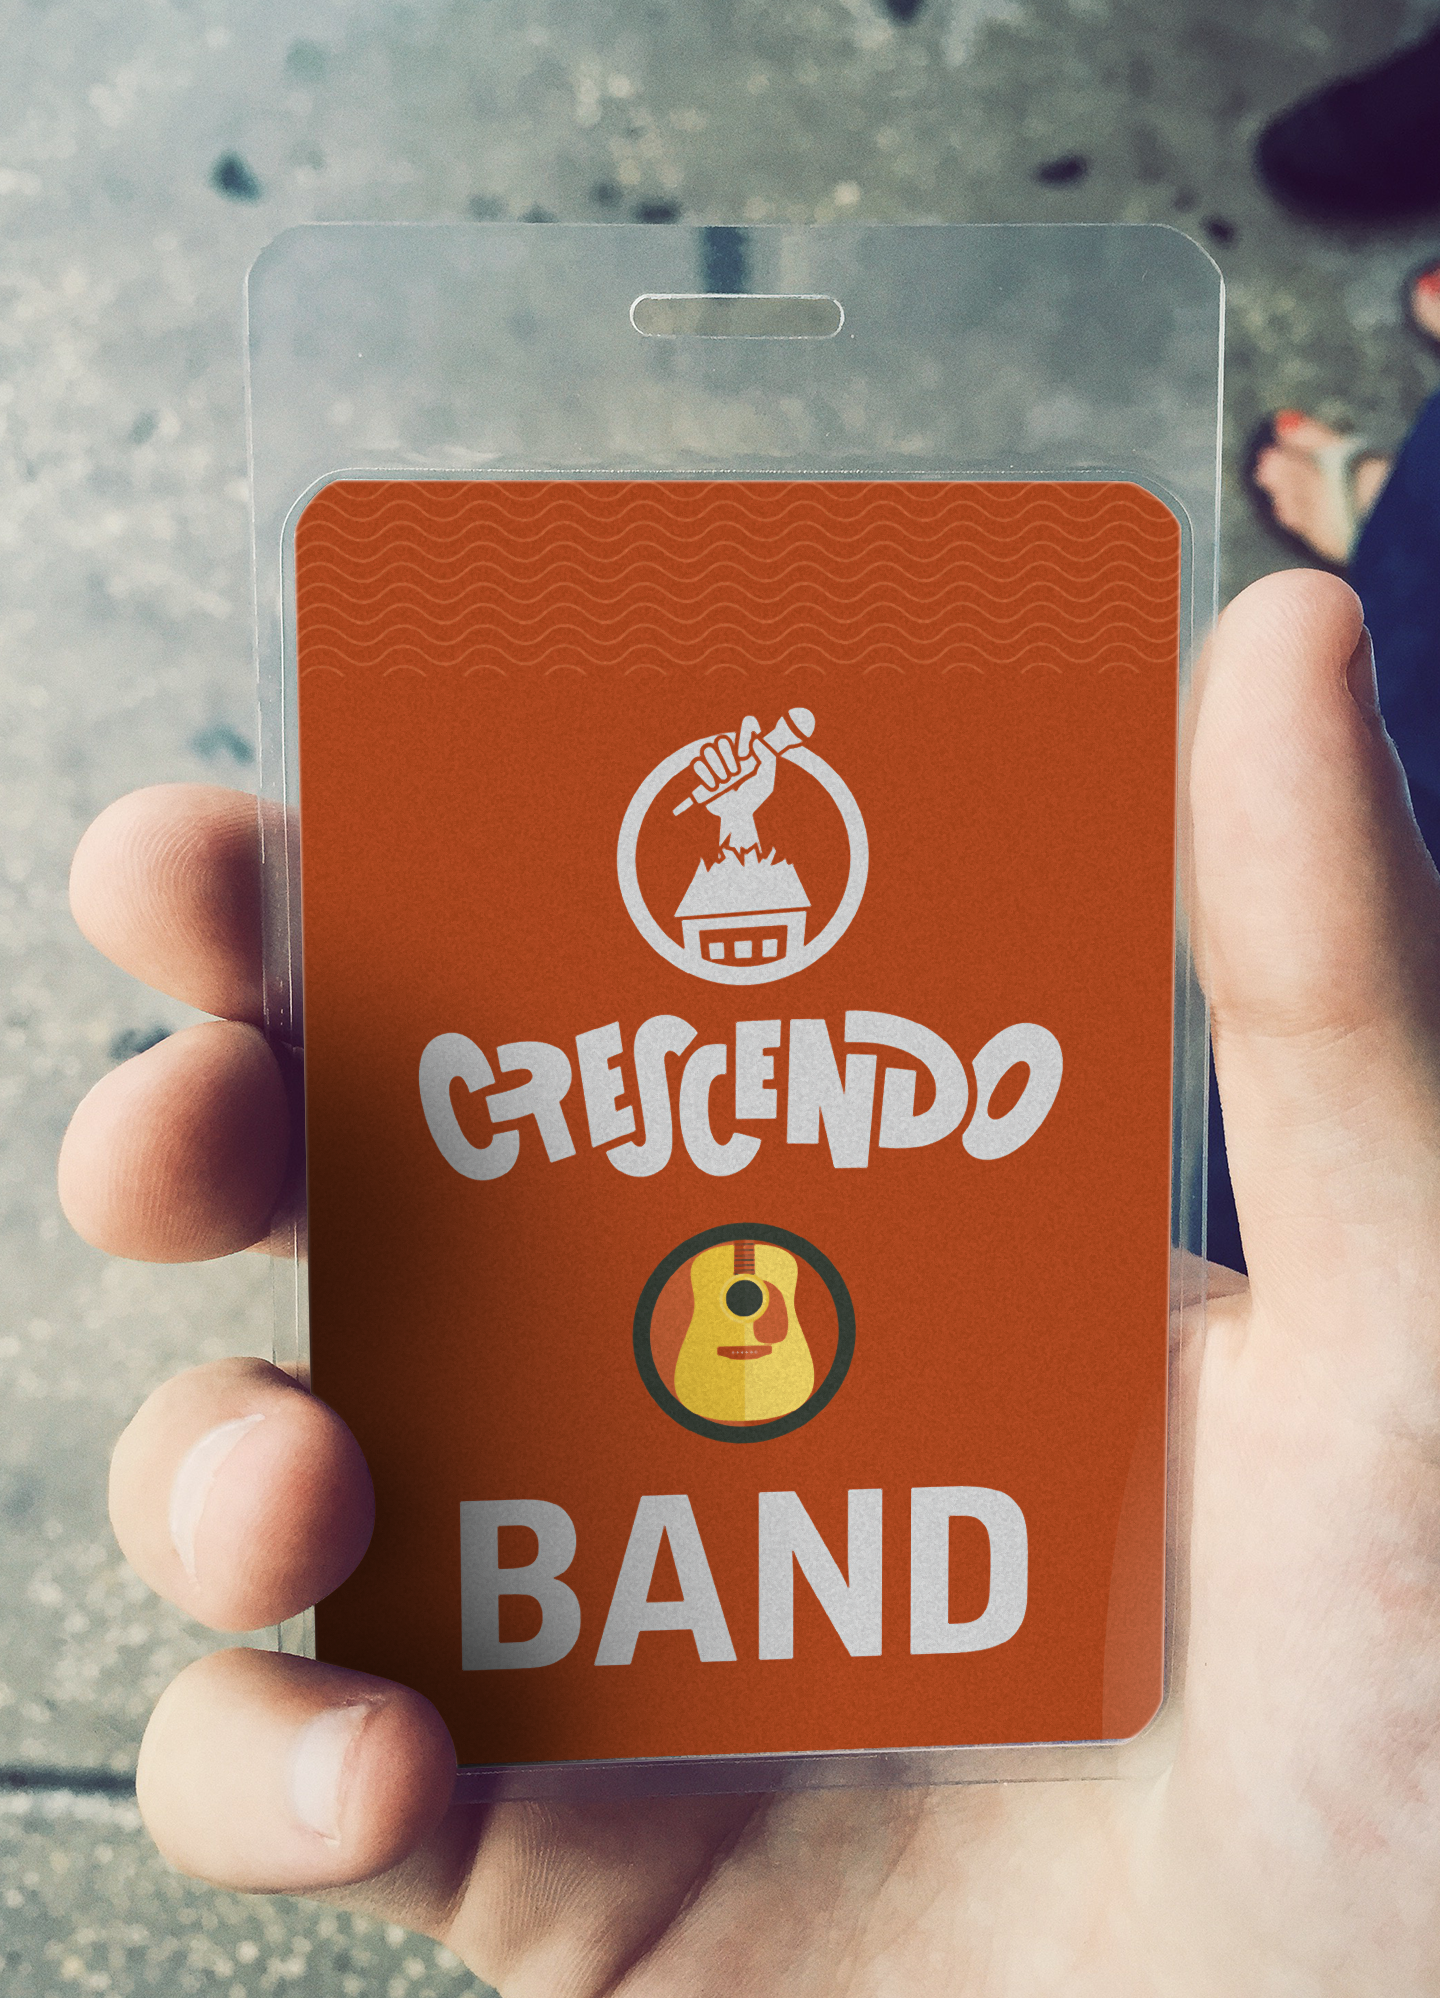 Band passes